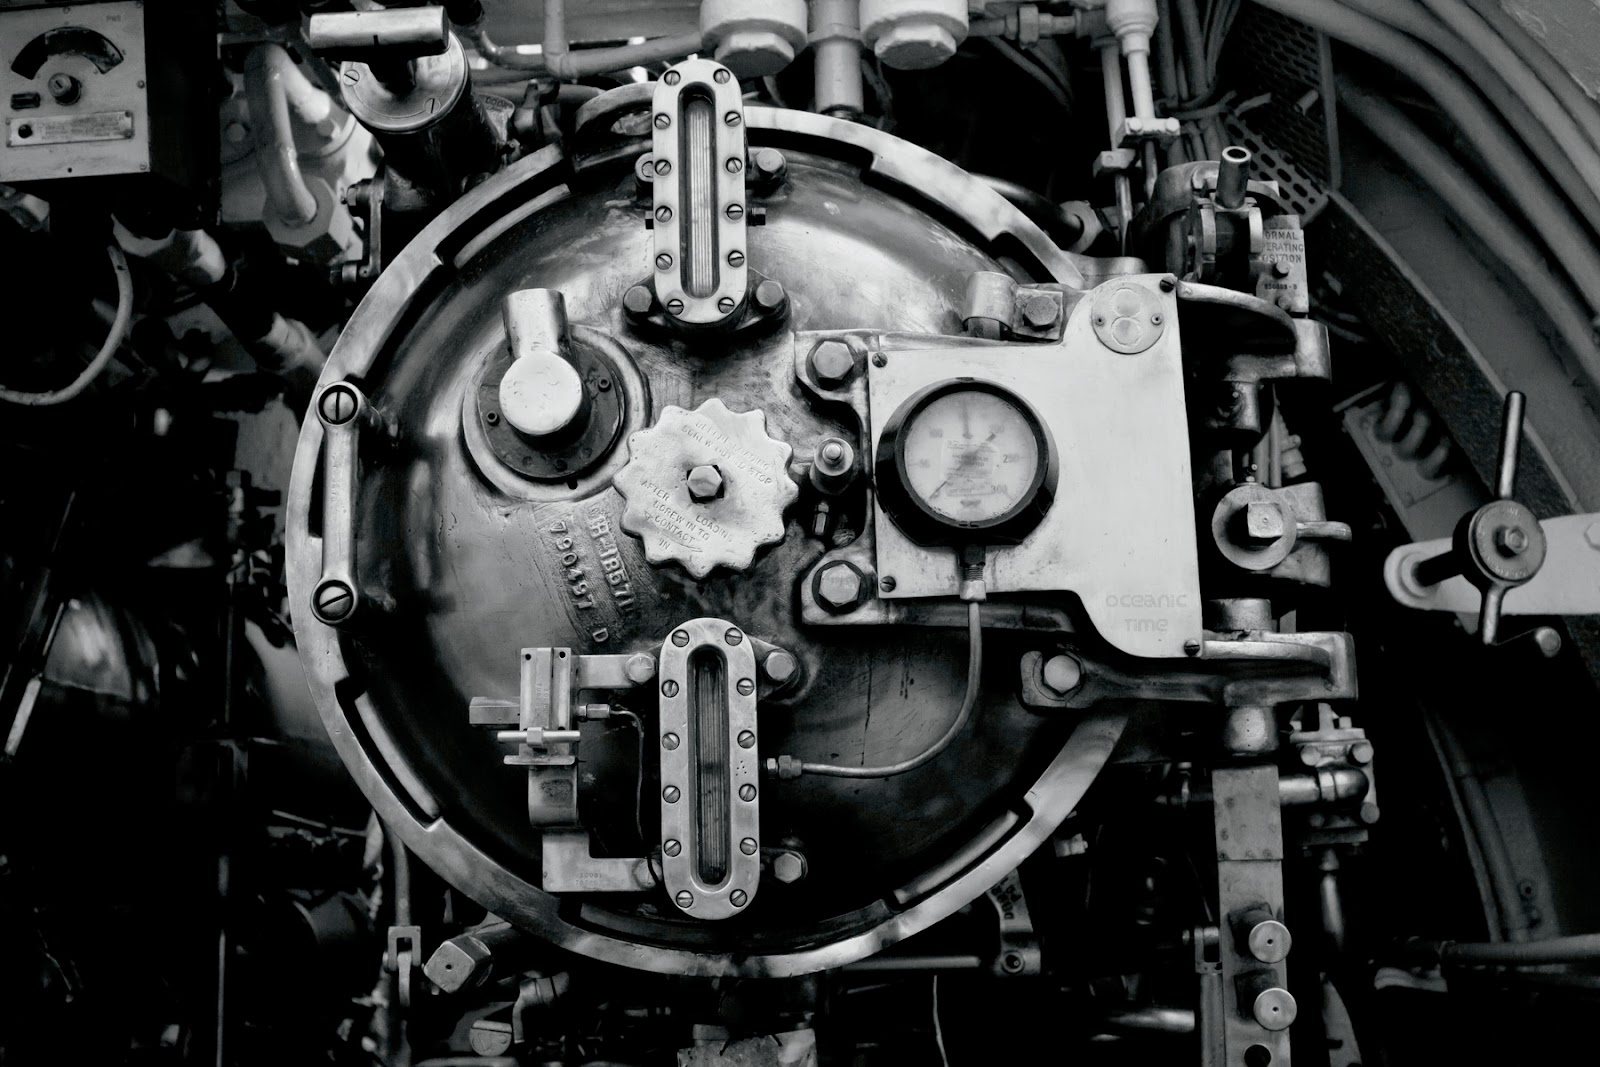 Ralf Tech - WRX Manufacture Torpedo Torpedo%2Bcontrol%2Bpannel